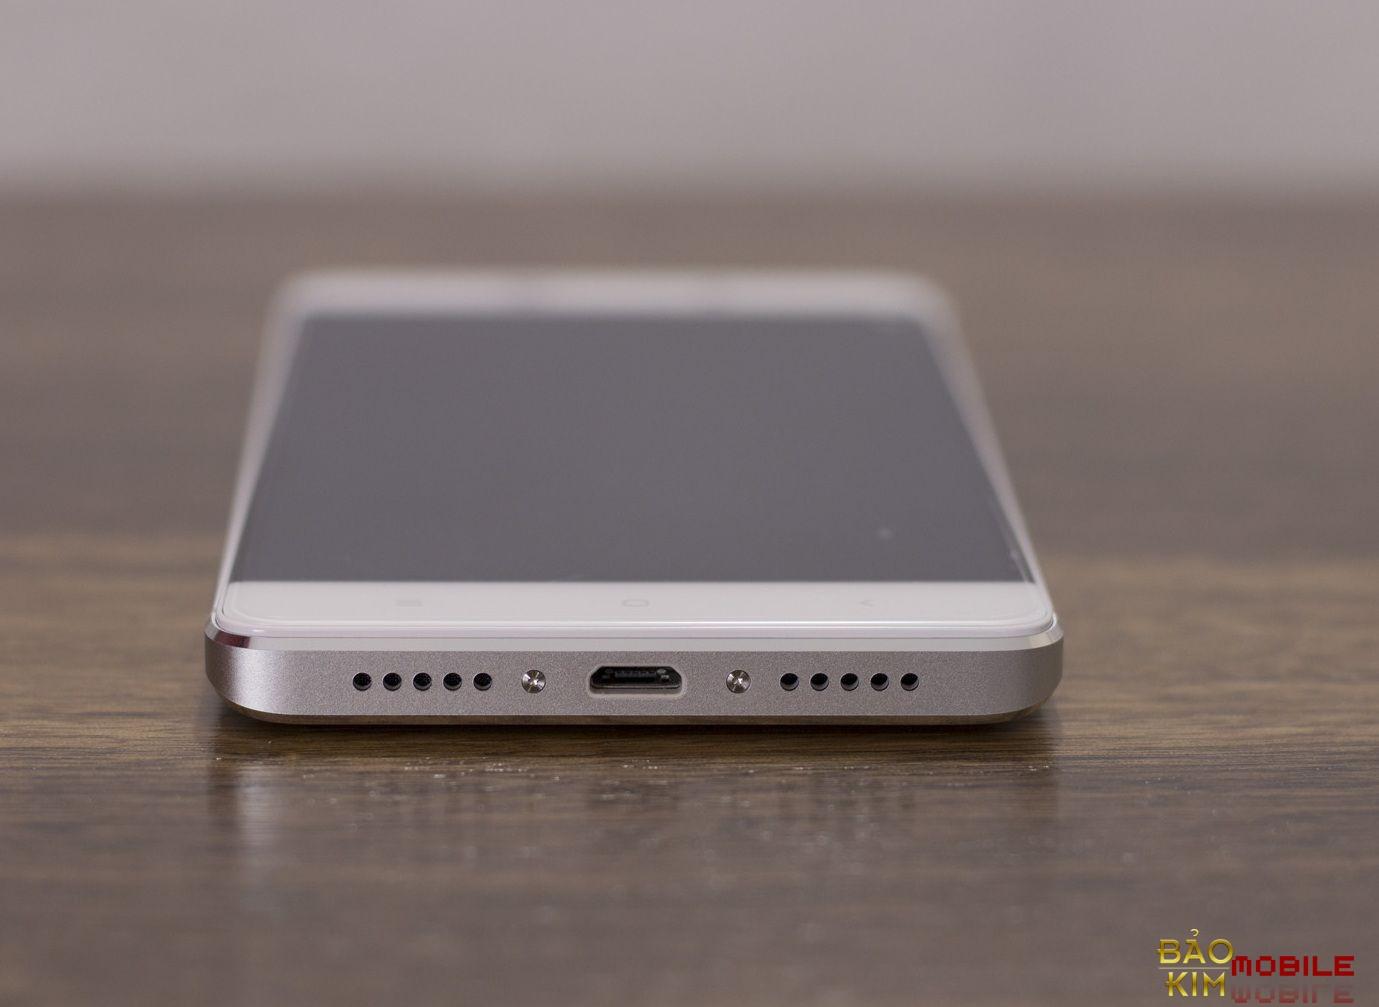 Thay chân sạc Xiaomi Redmi 4, 4X